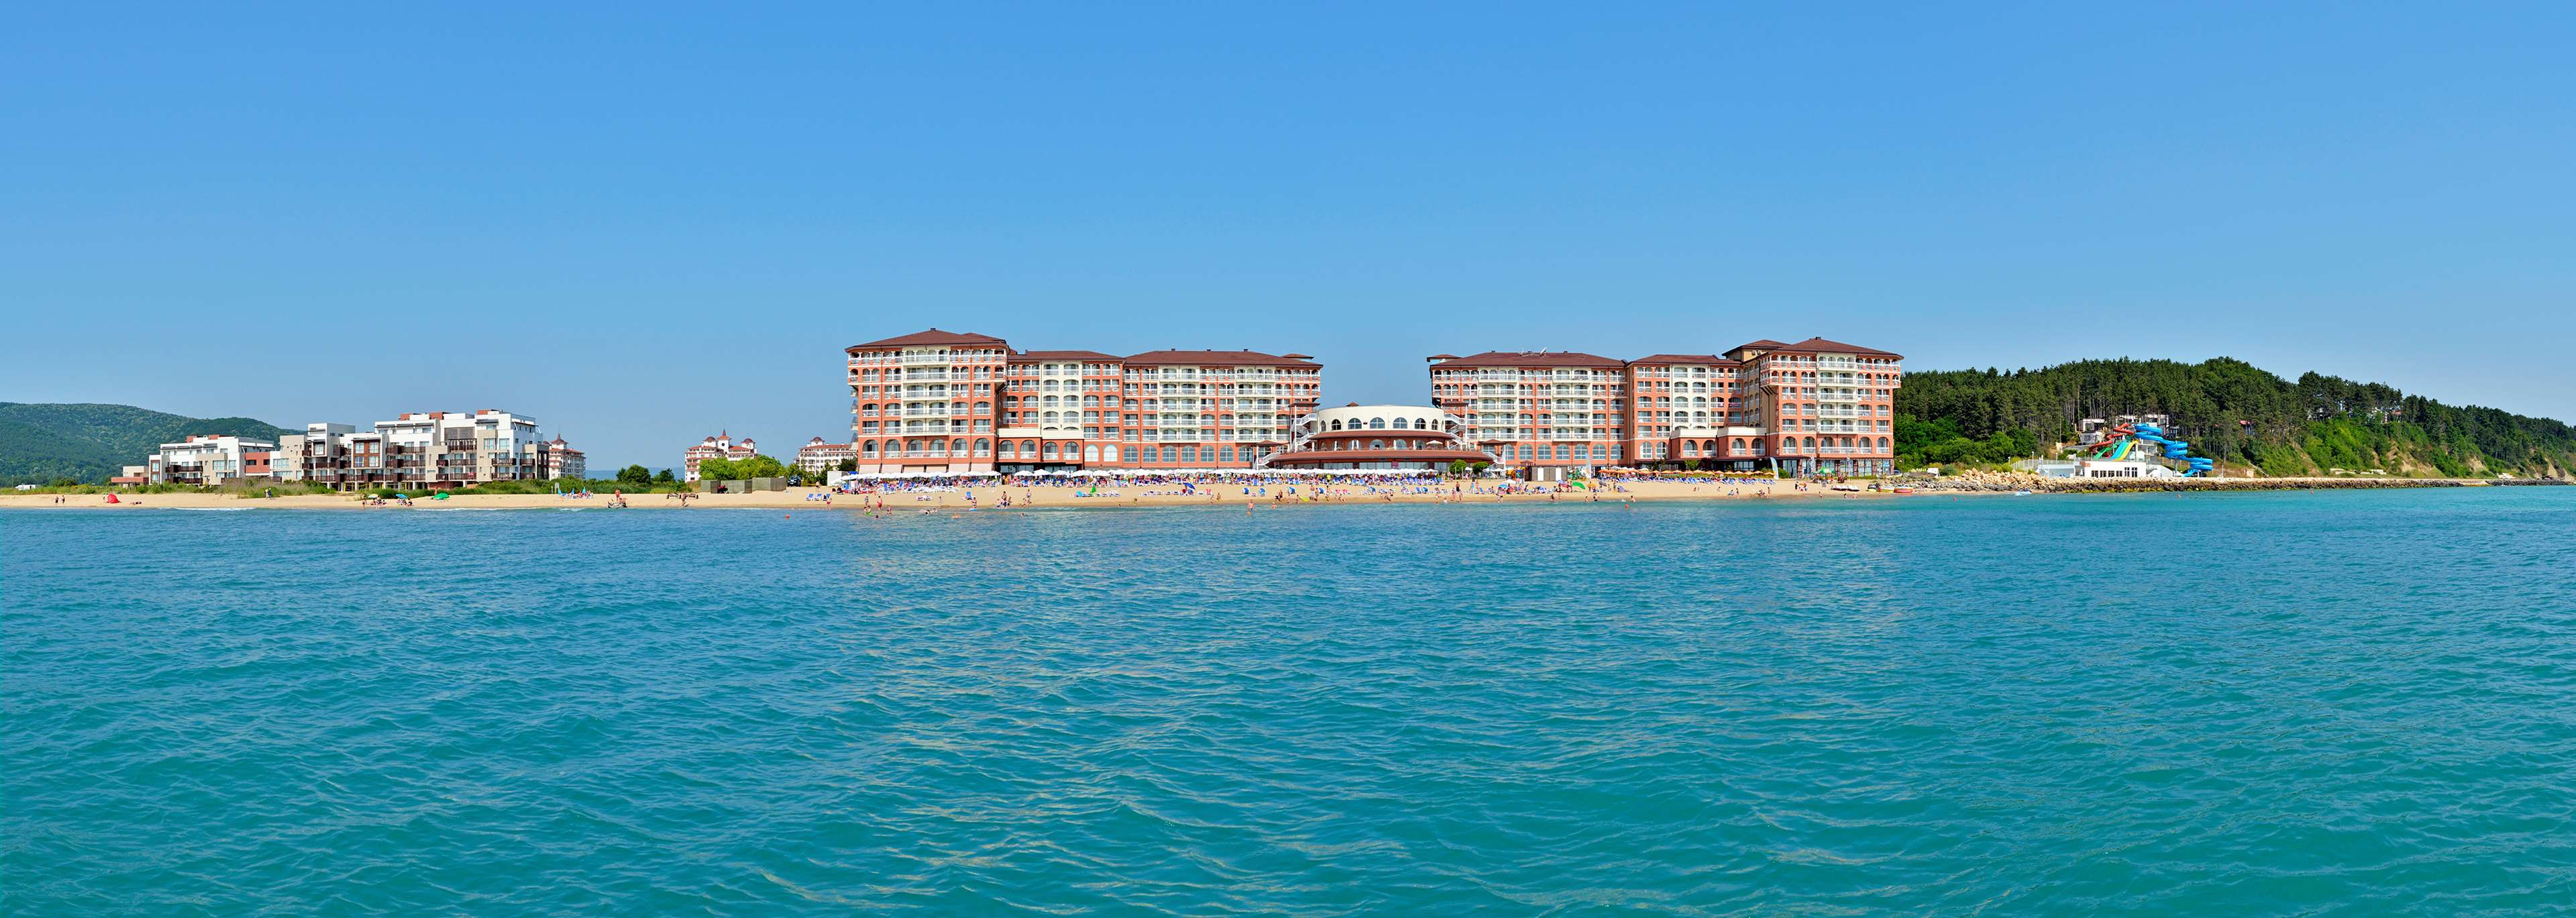 Hotel Sol Luna Bay & Mare Resort in Obsor Bulgarien buchen